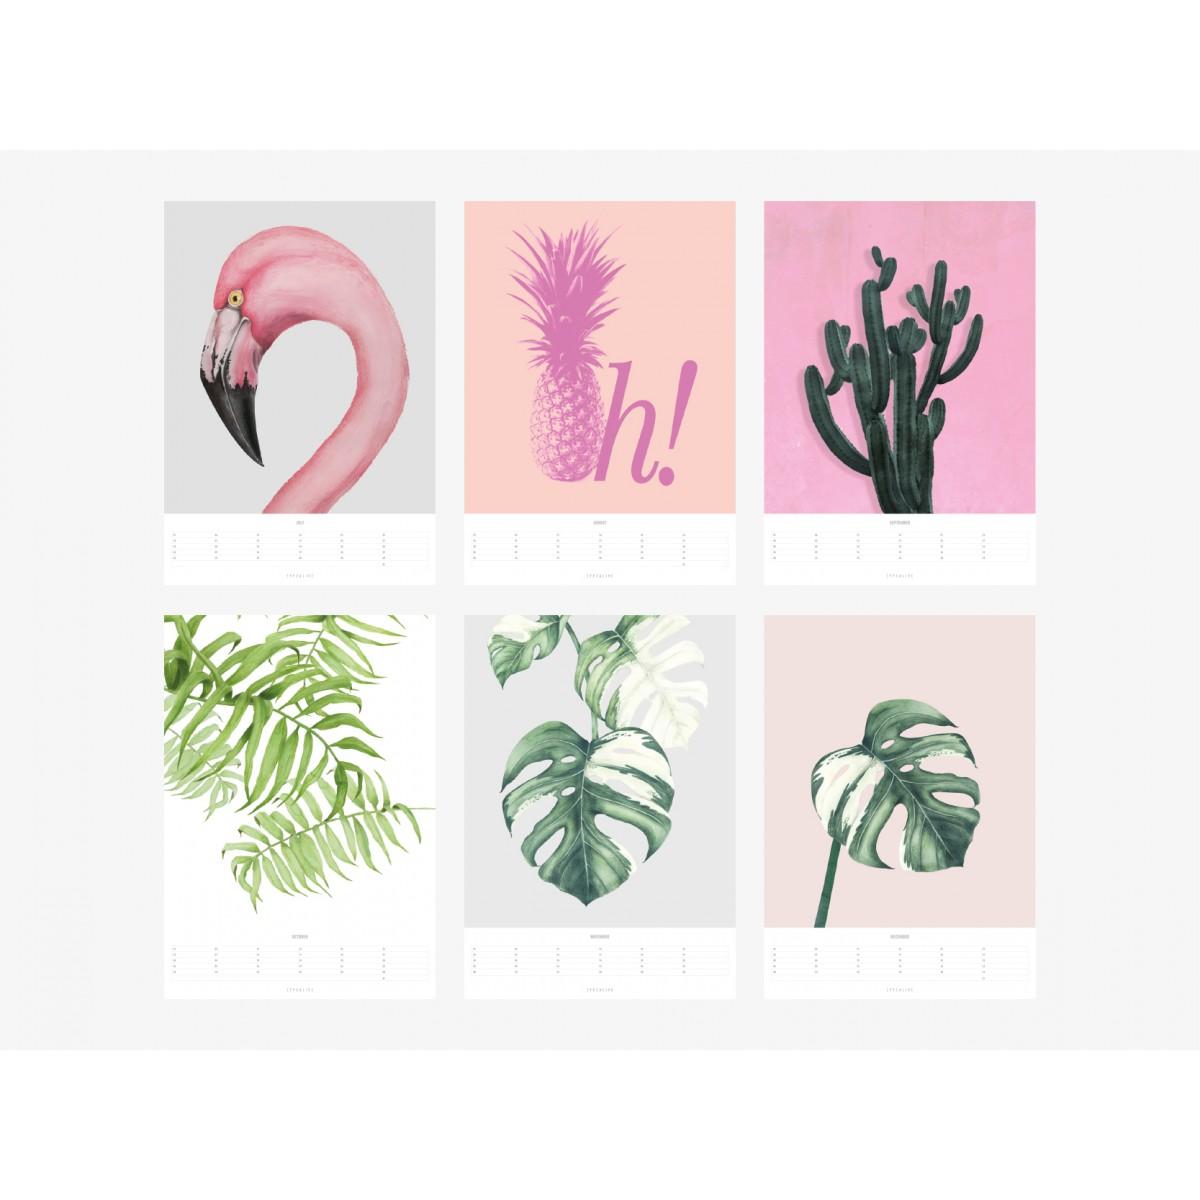 typealive / Wandkalender / Tropical